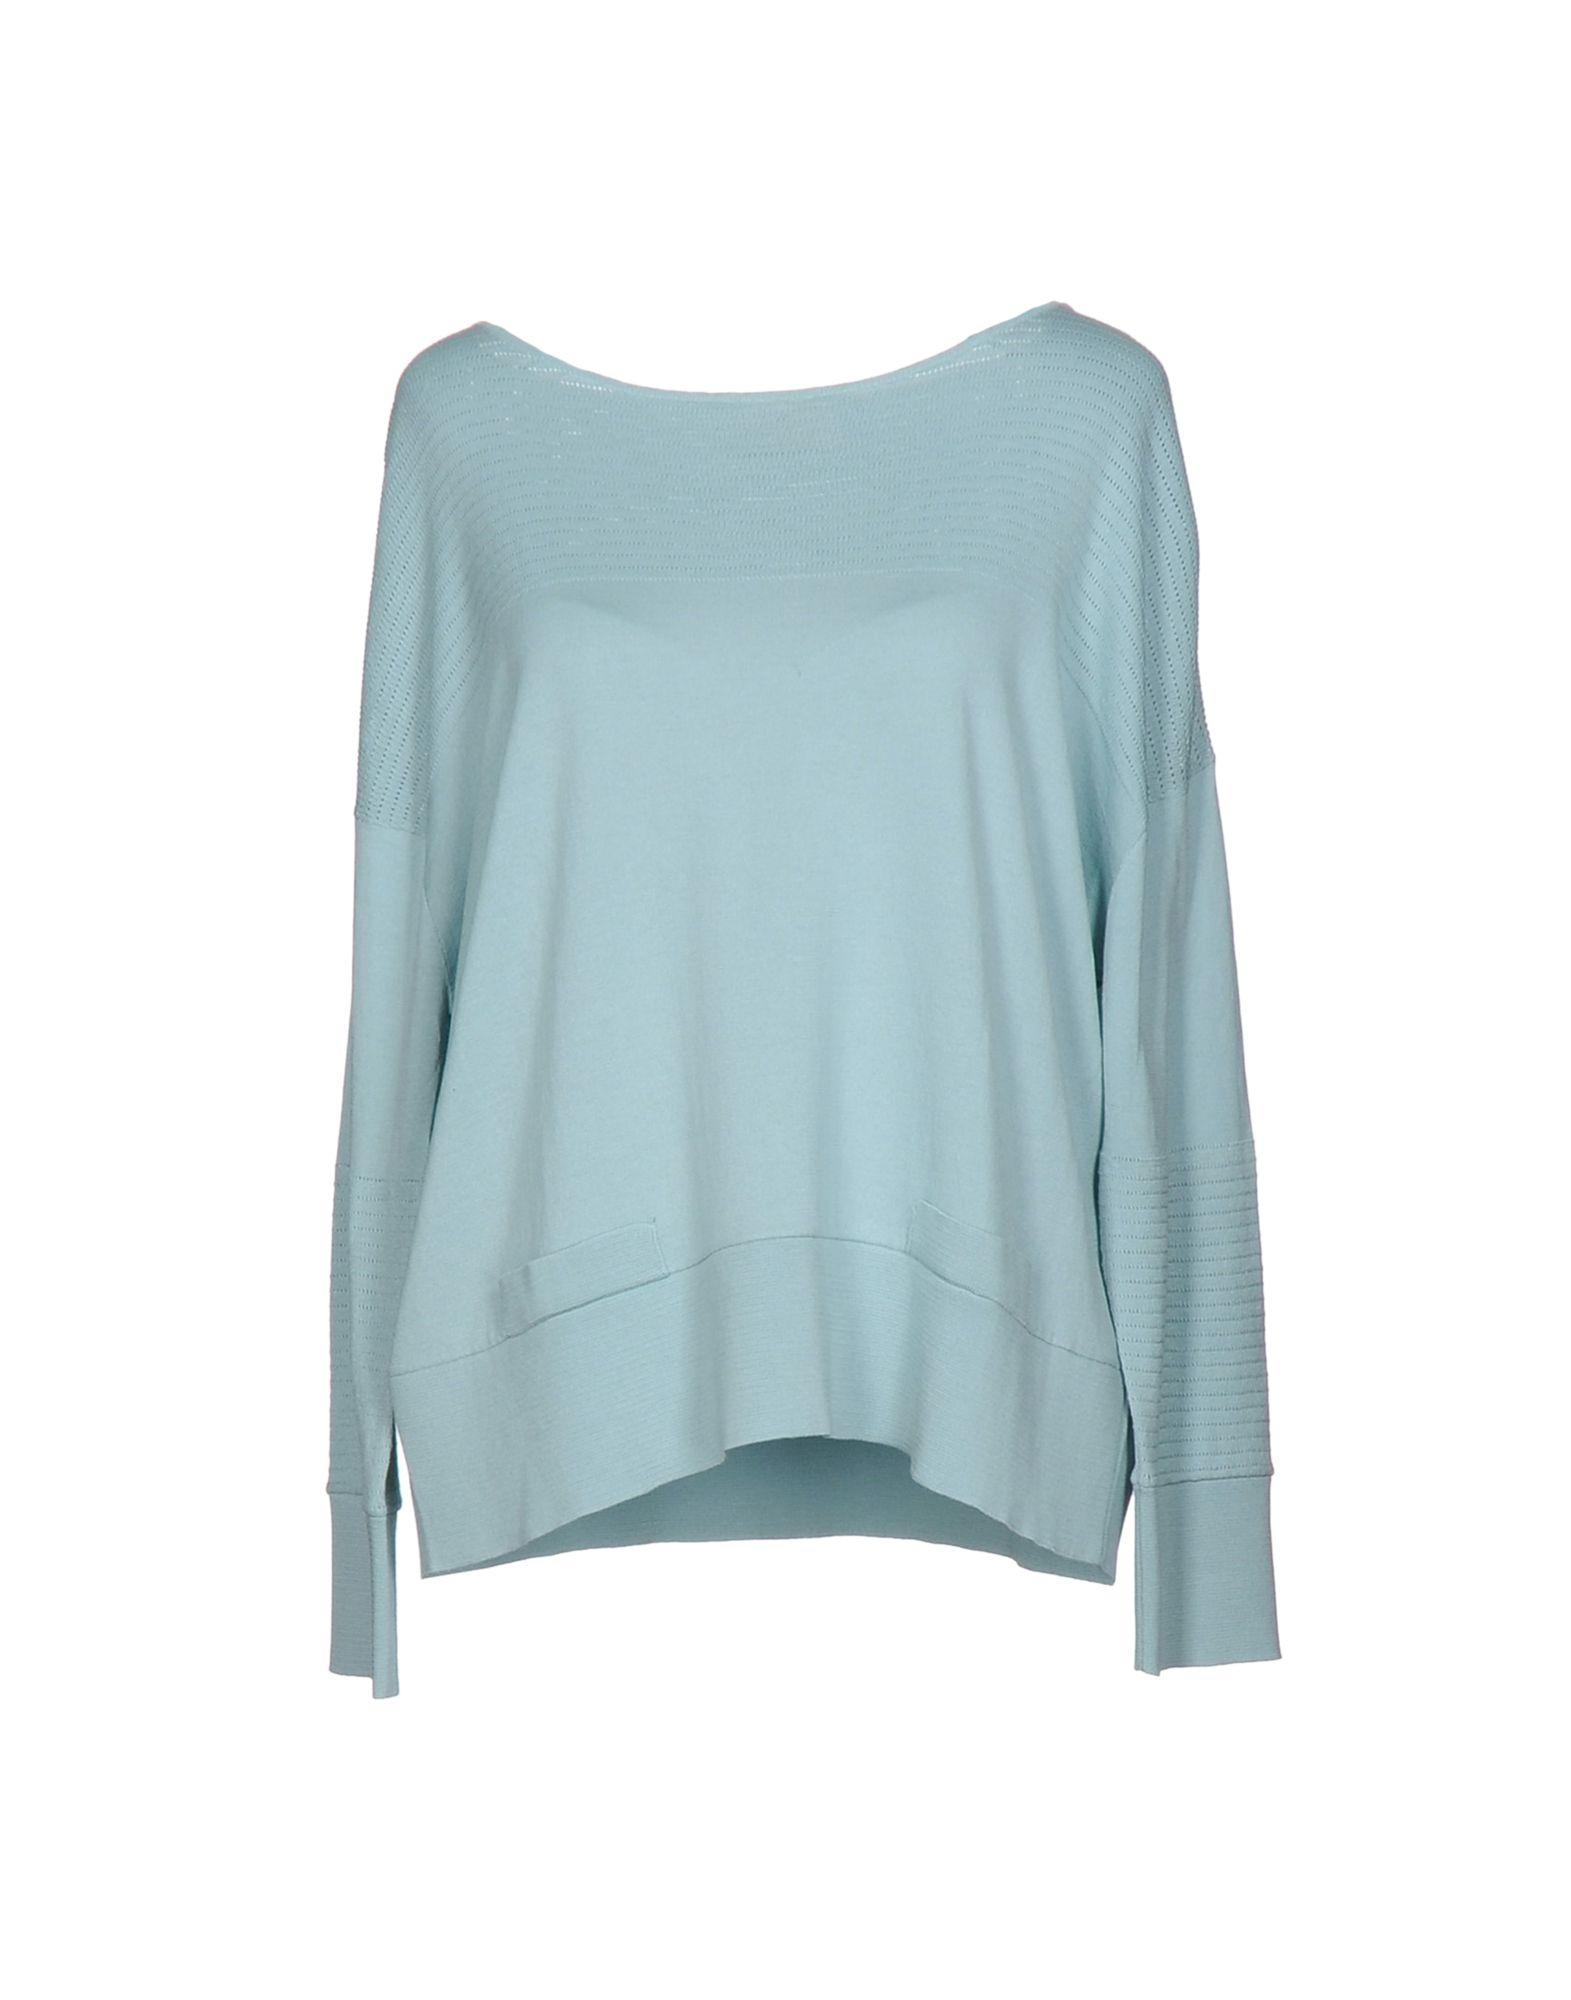 MAISON ULLENS Sweater in Light Green